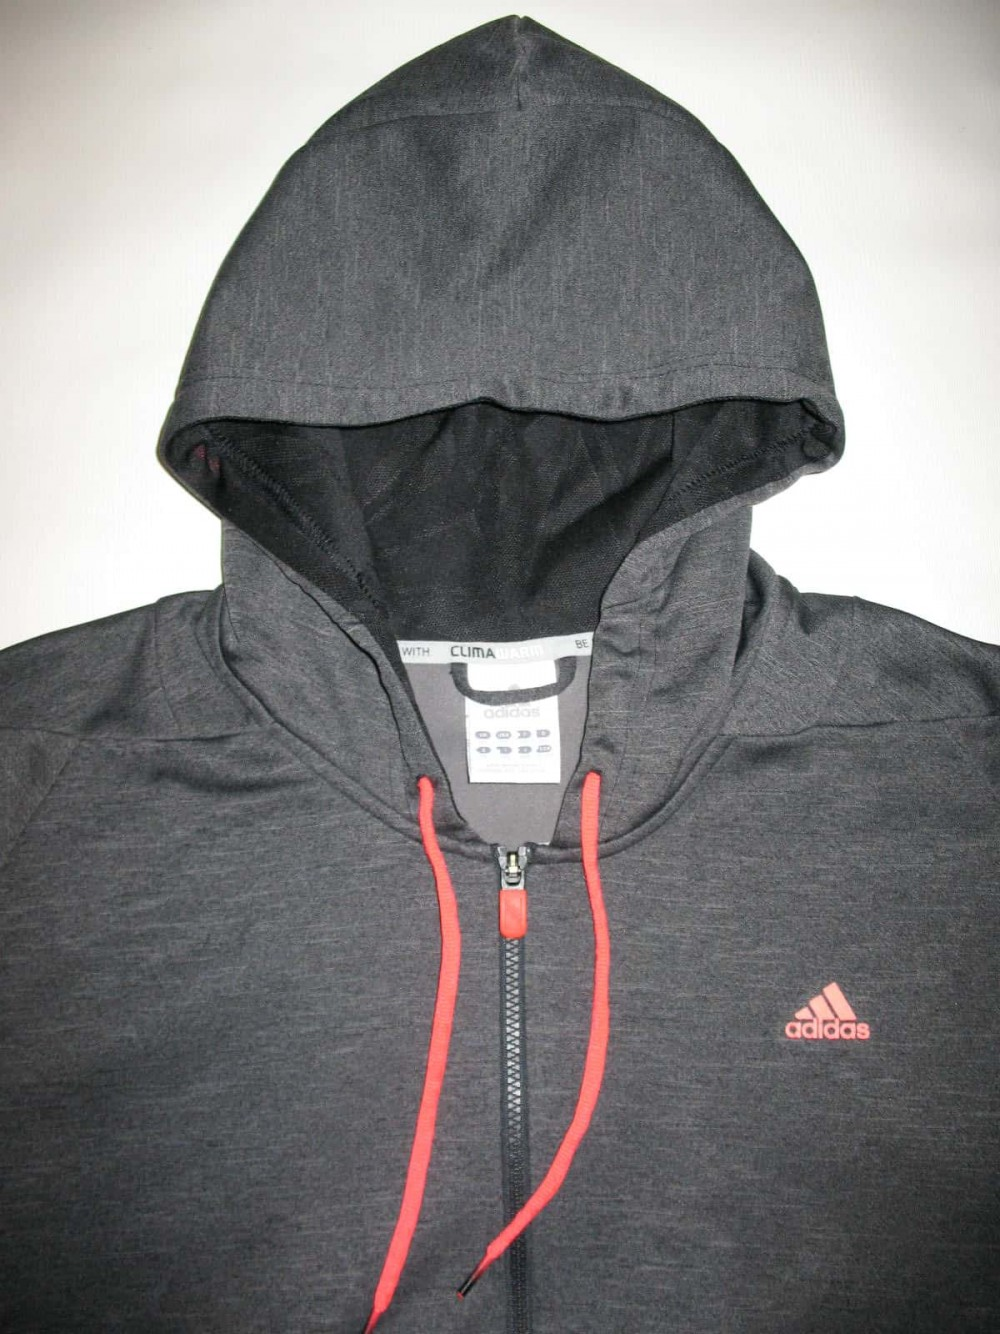 Кофта ADIDAS fleece hoodies jersey (размер XXL) - 1